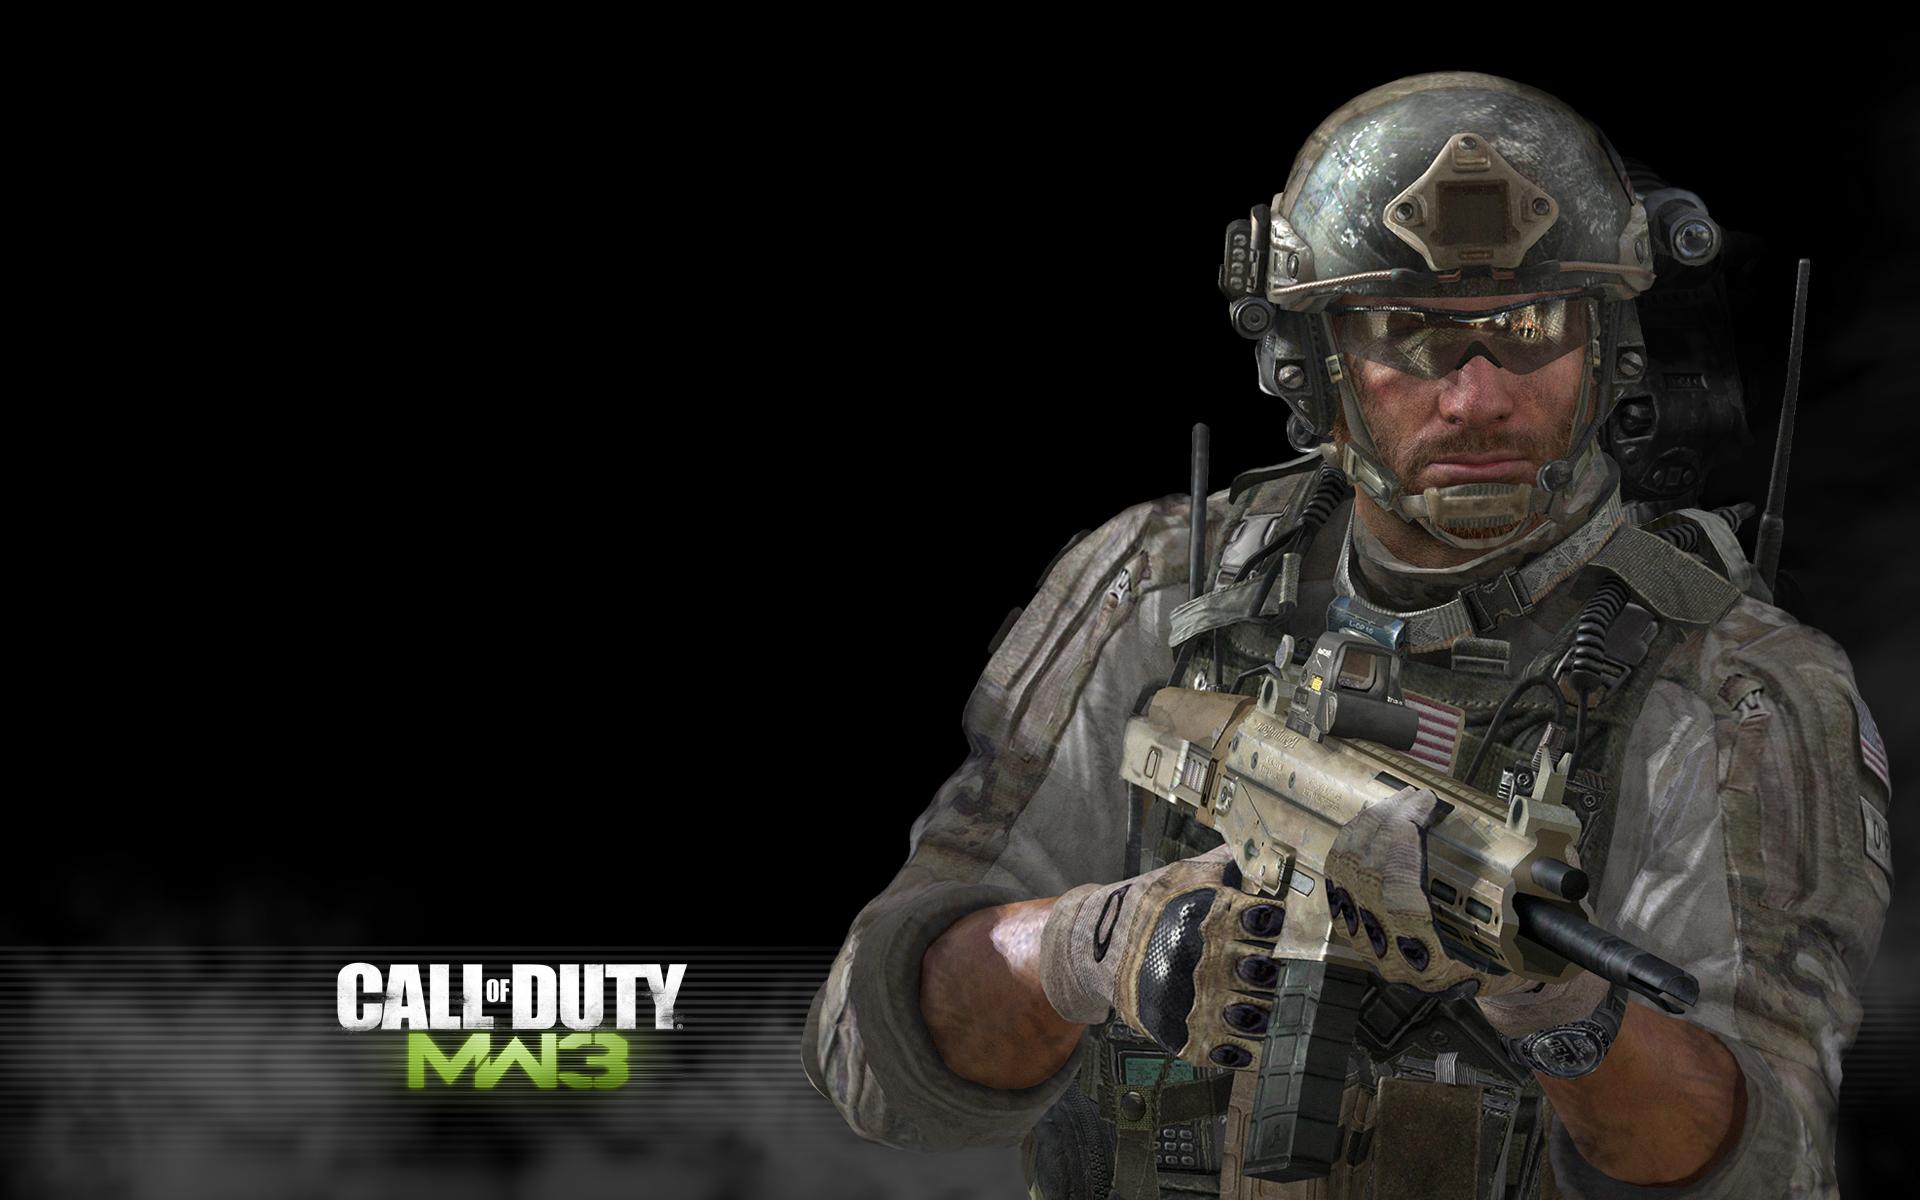 http://g-ecx.images-amazon.com/images/G/01/videogames/promo/WALLPAPER1920X1200A.jpg